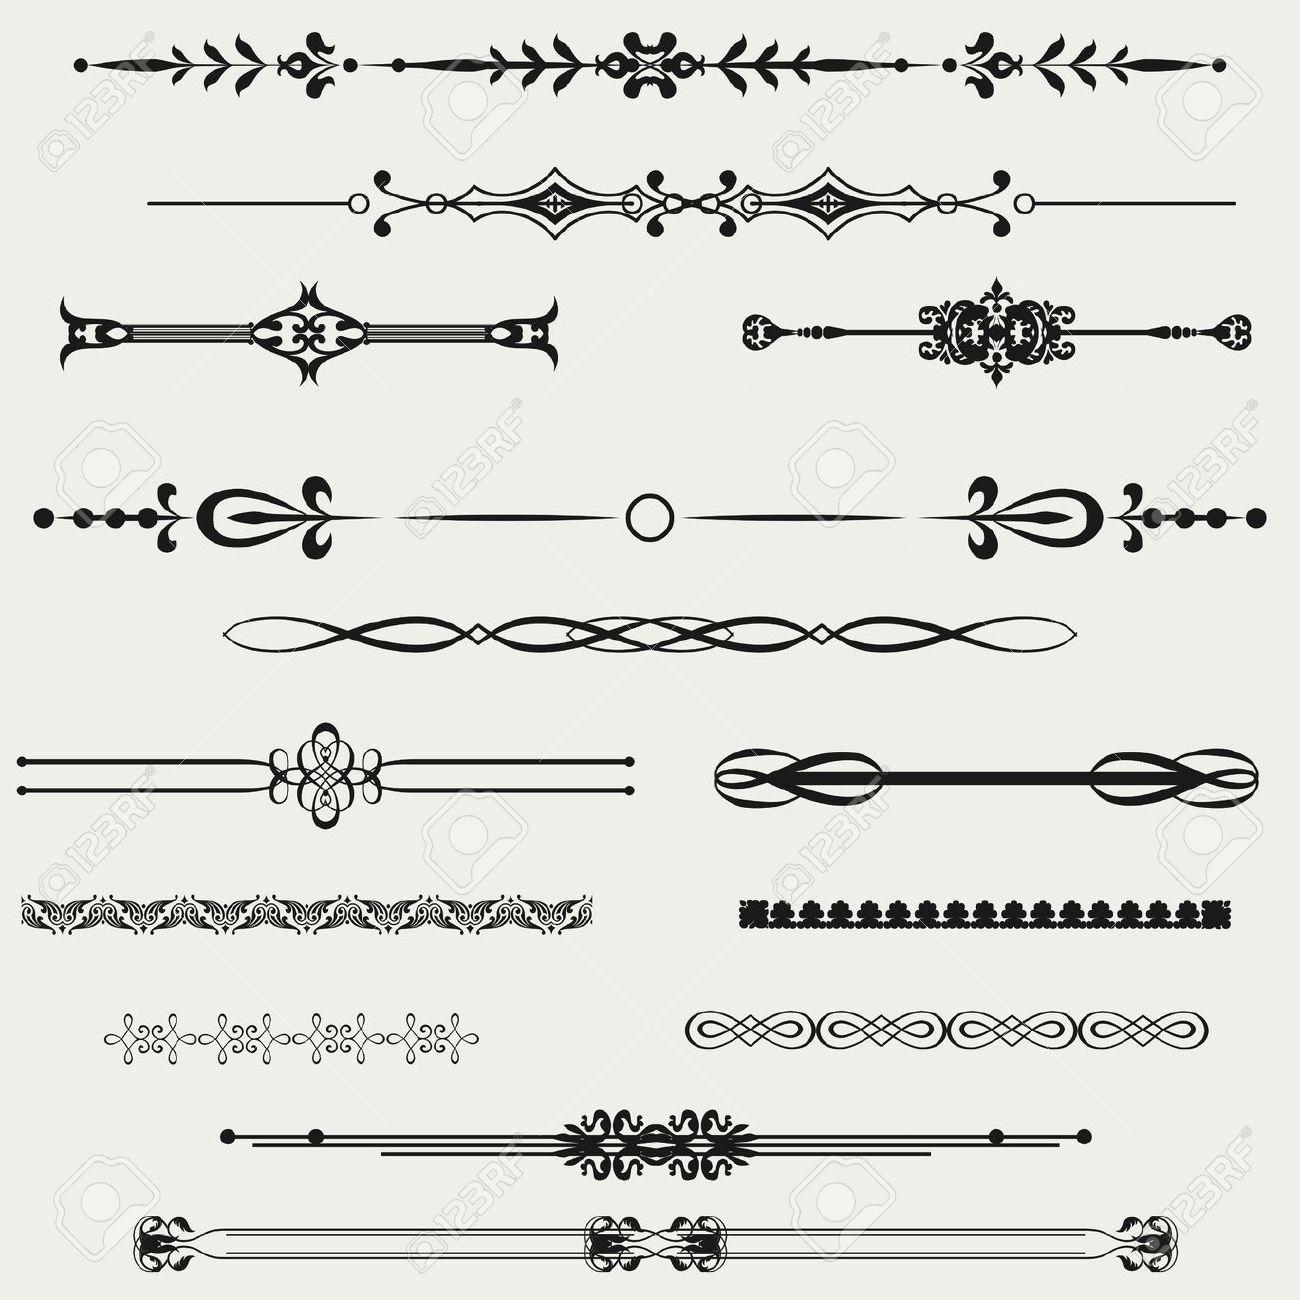 1300x1300 Calligraphy Clipart Borders Horizontal